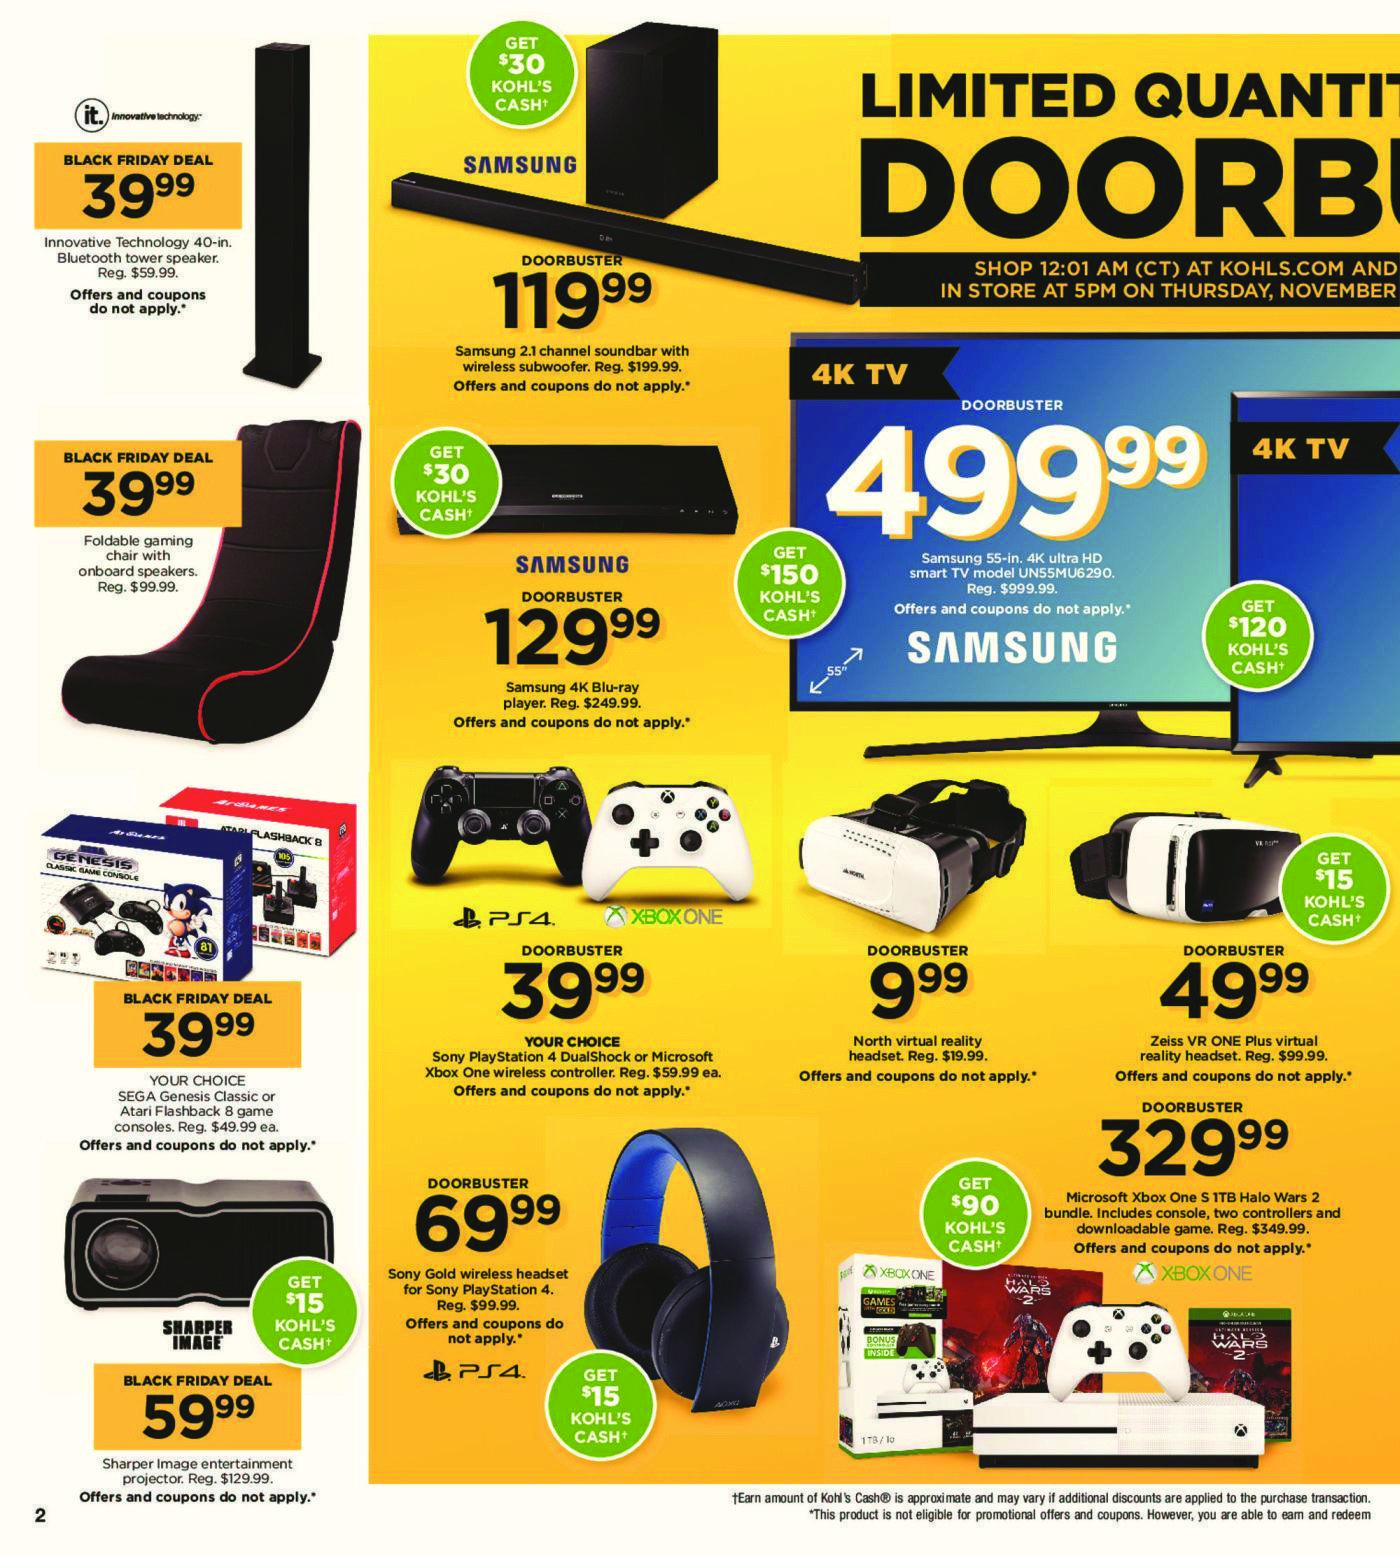 Kohls Black Friday 2017 Ads Scan Deals And Sales Page 2